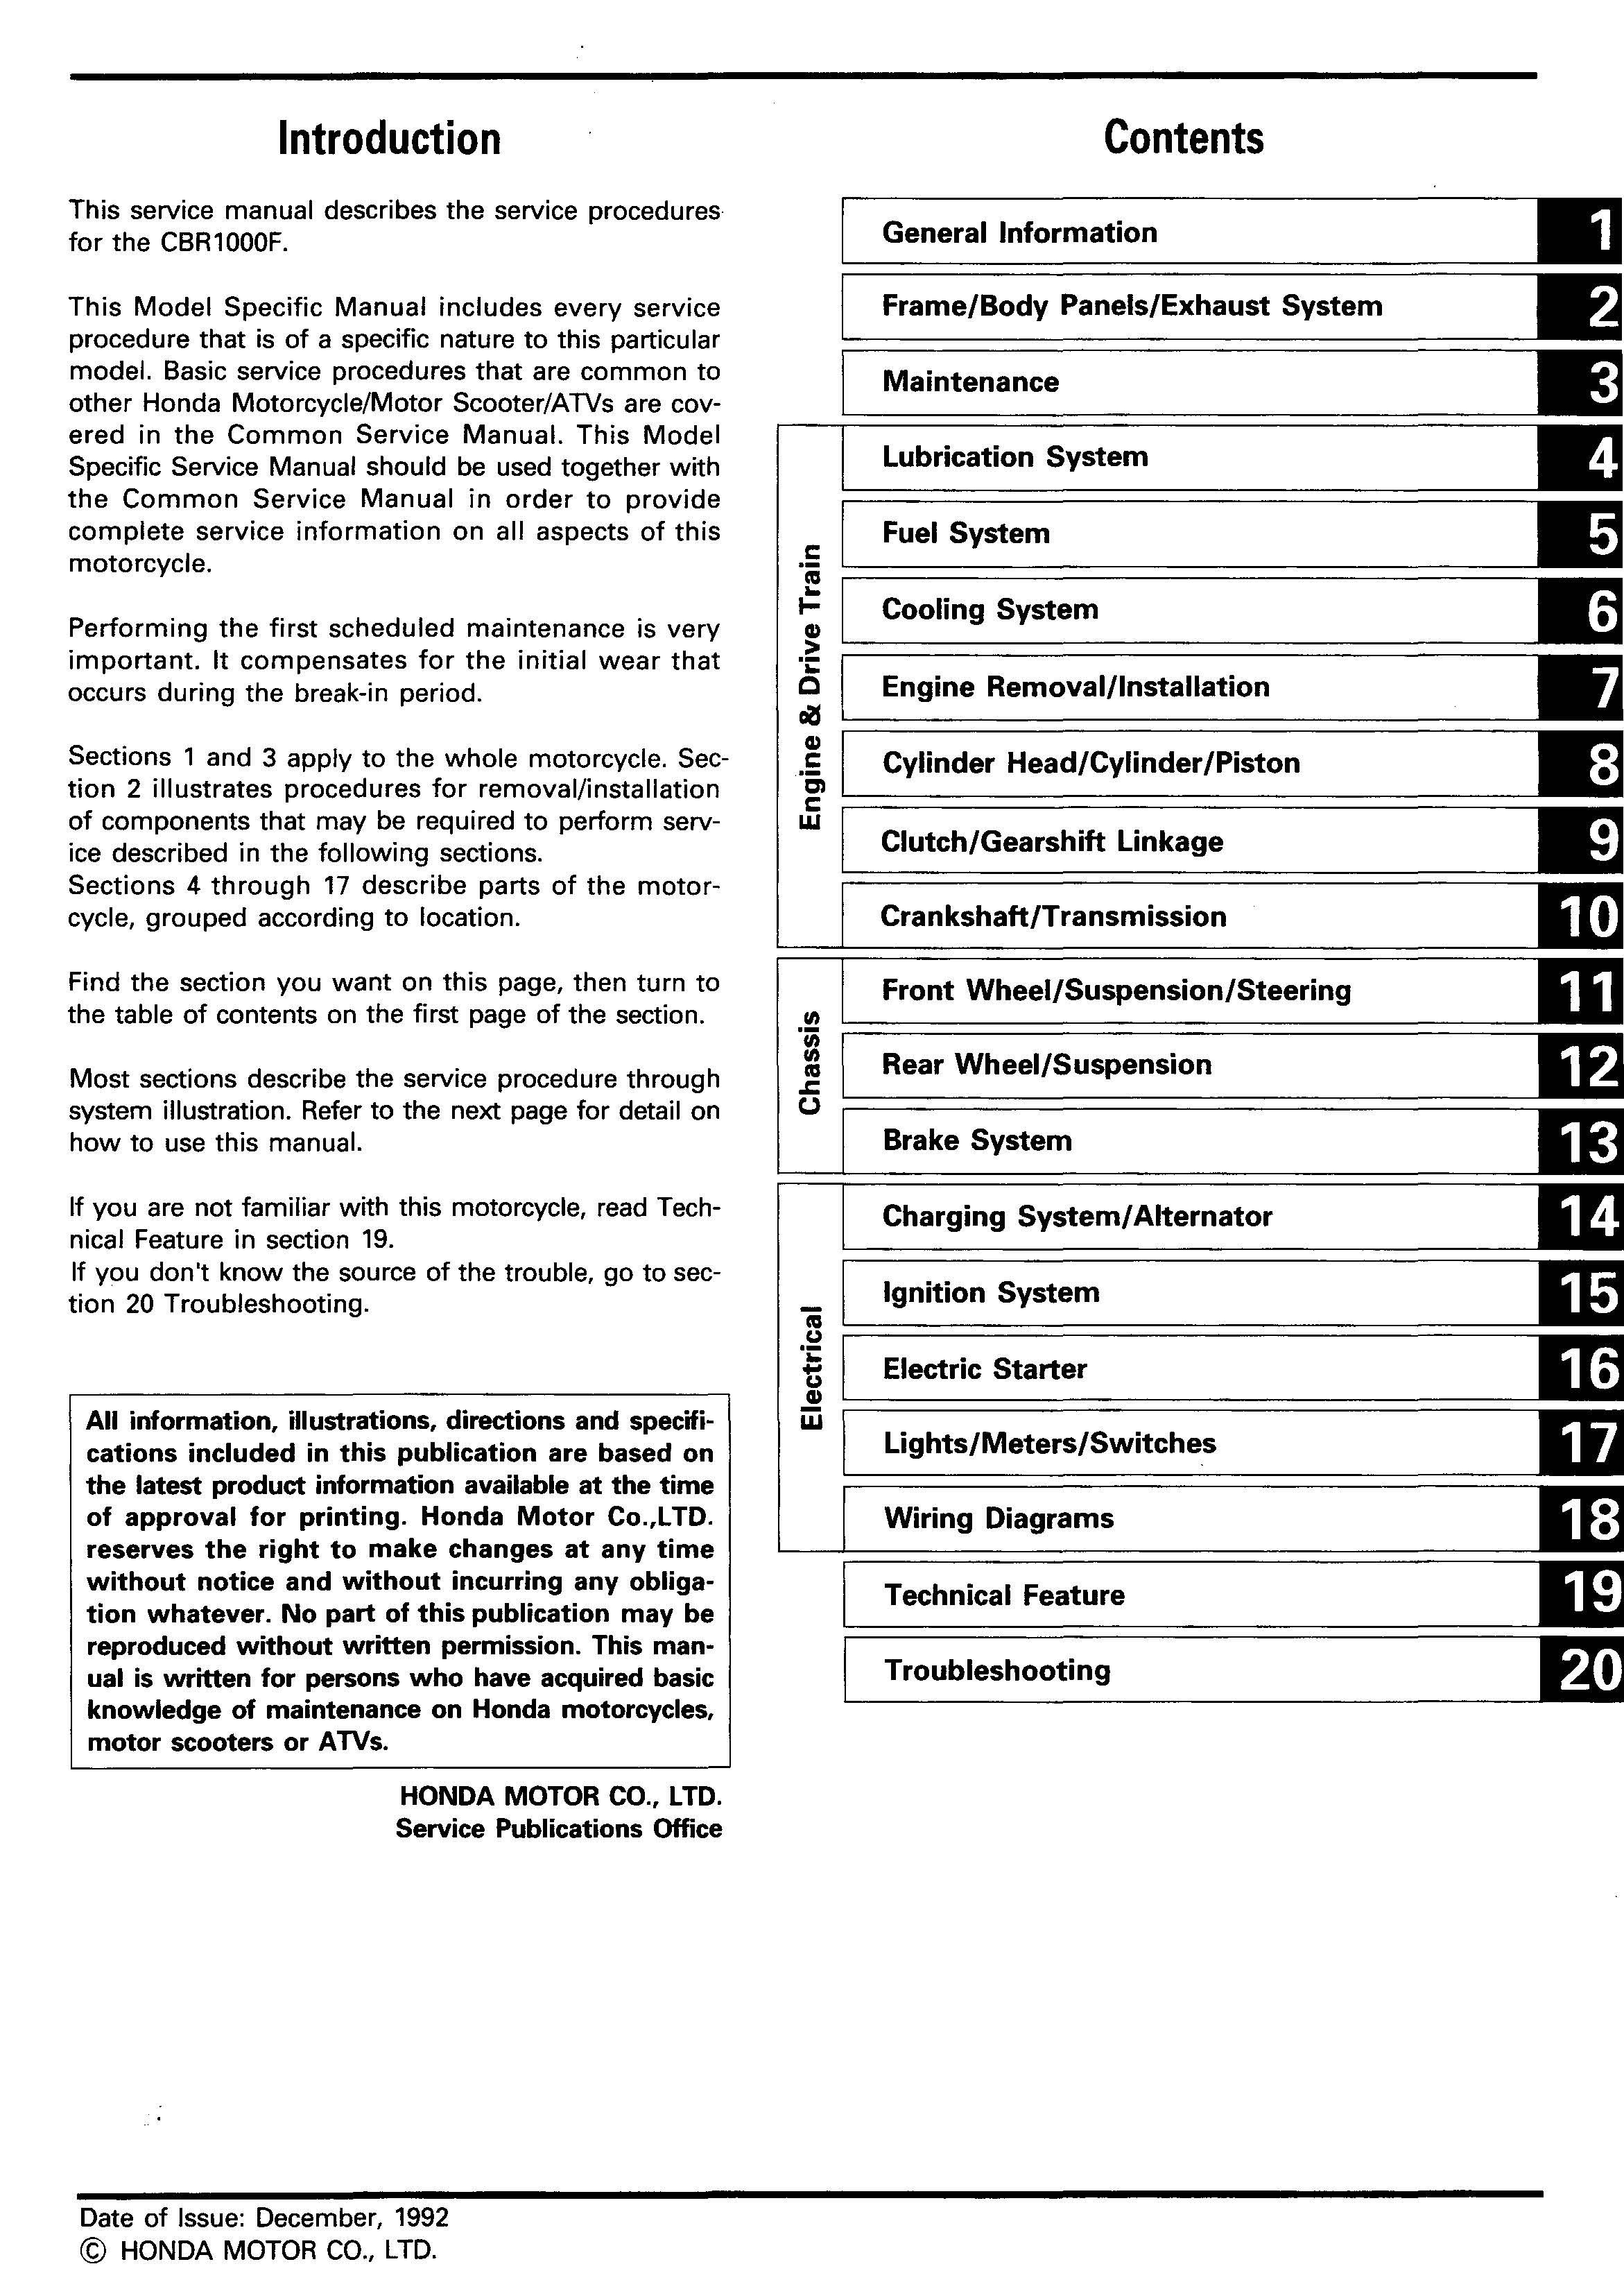 Workshop manual for Honda CBR1000F (1992)